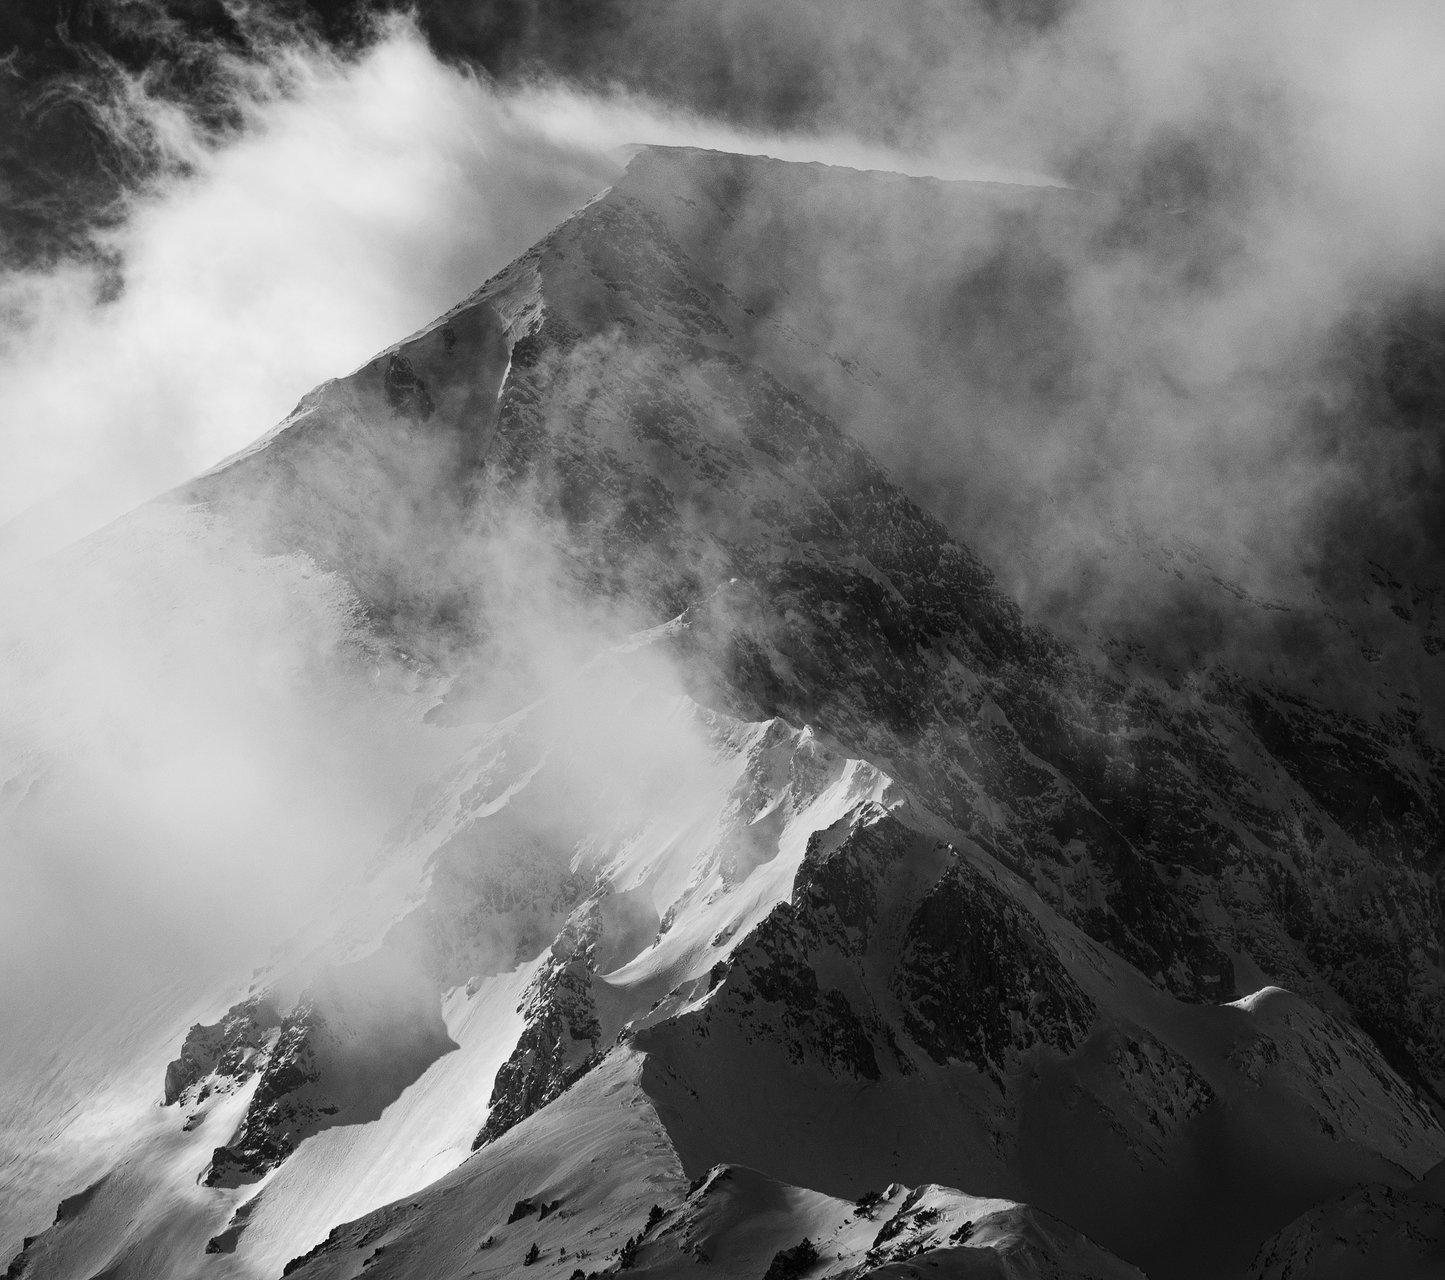 Вихрен.. | Author David Kirilov - Dido99 | PHOTO FORUM